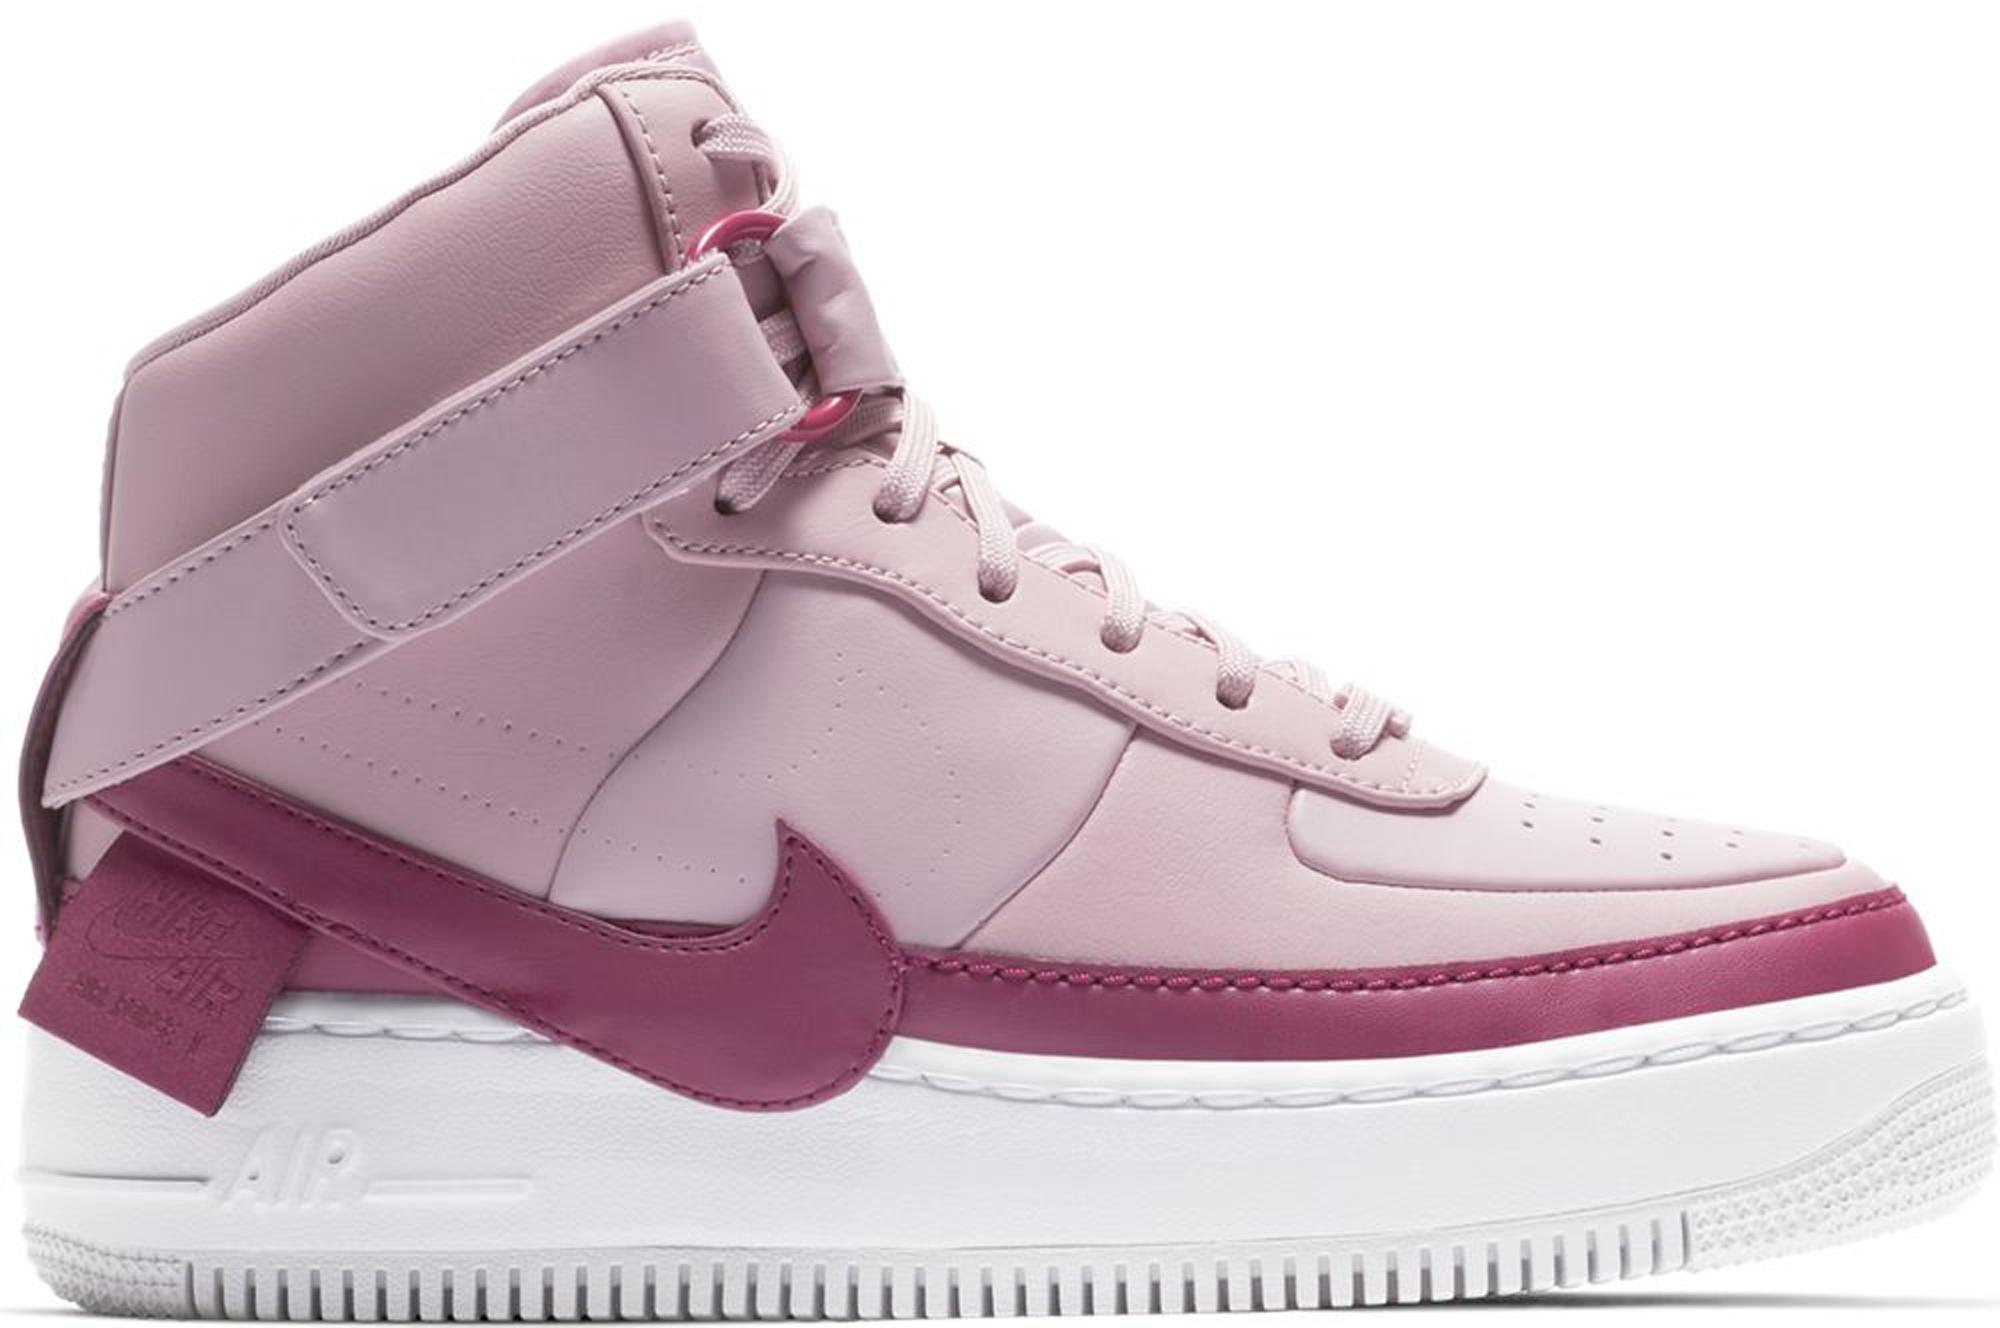 Nike Air Force 1 Jester High XX Plum